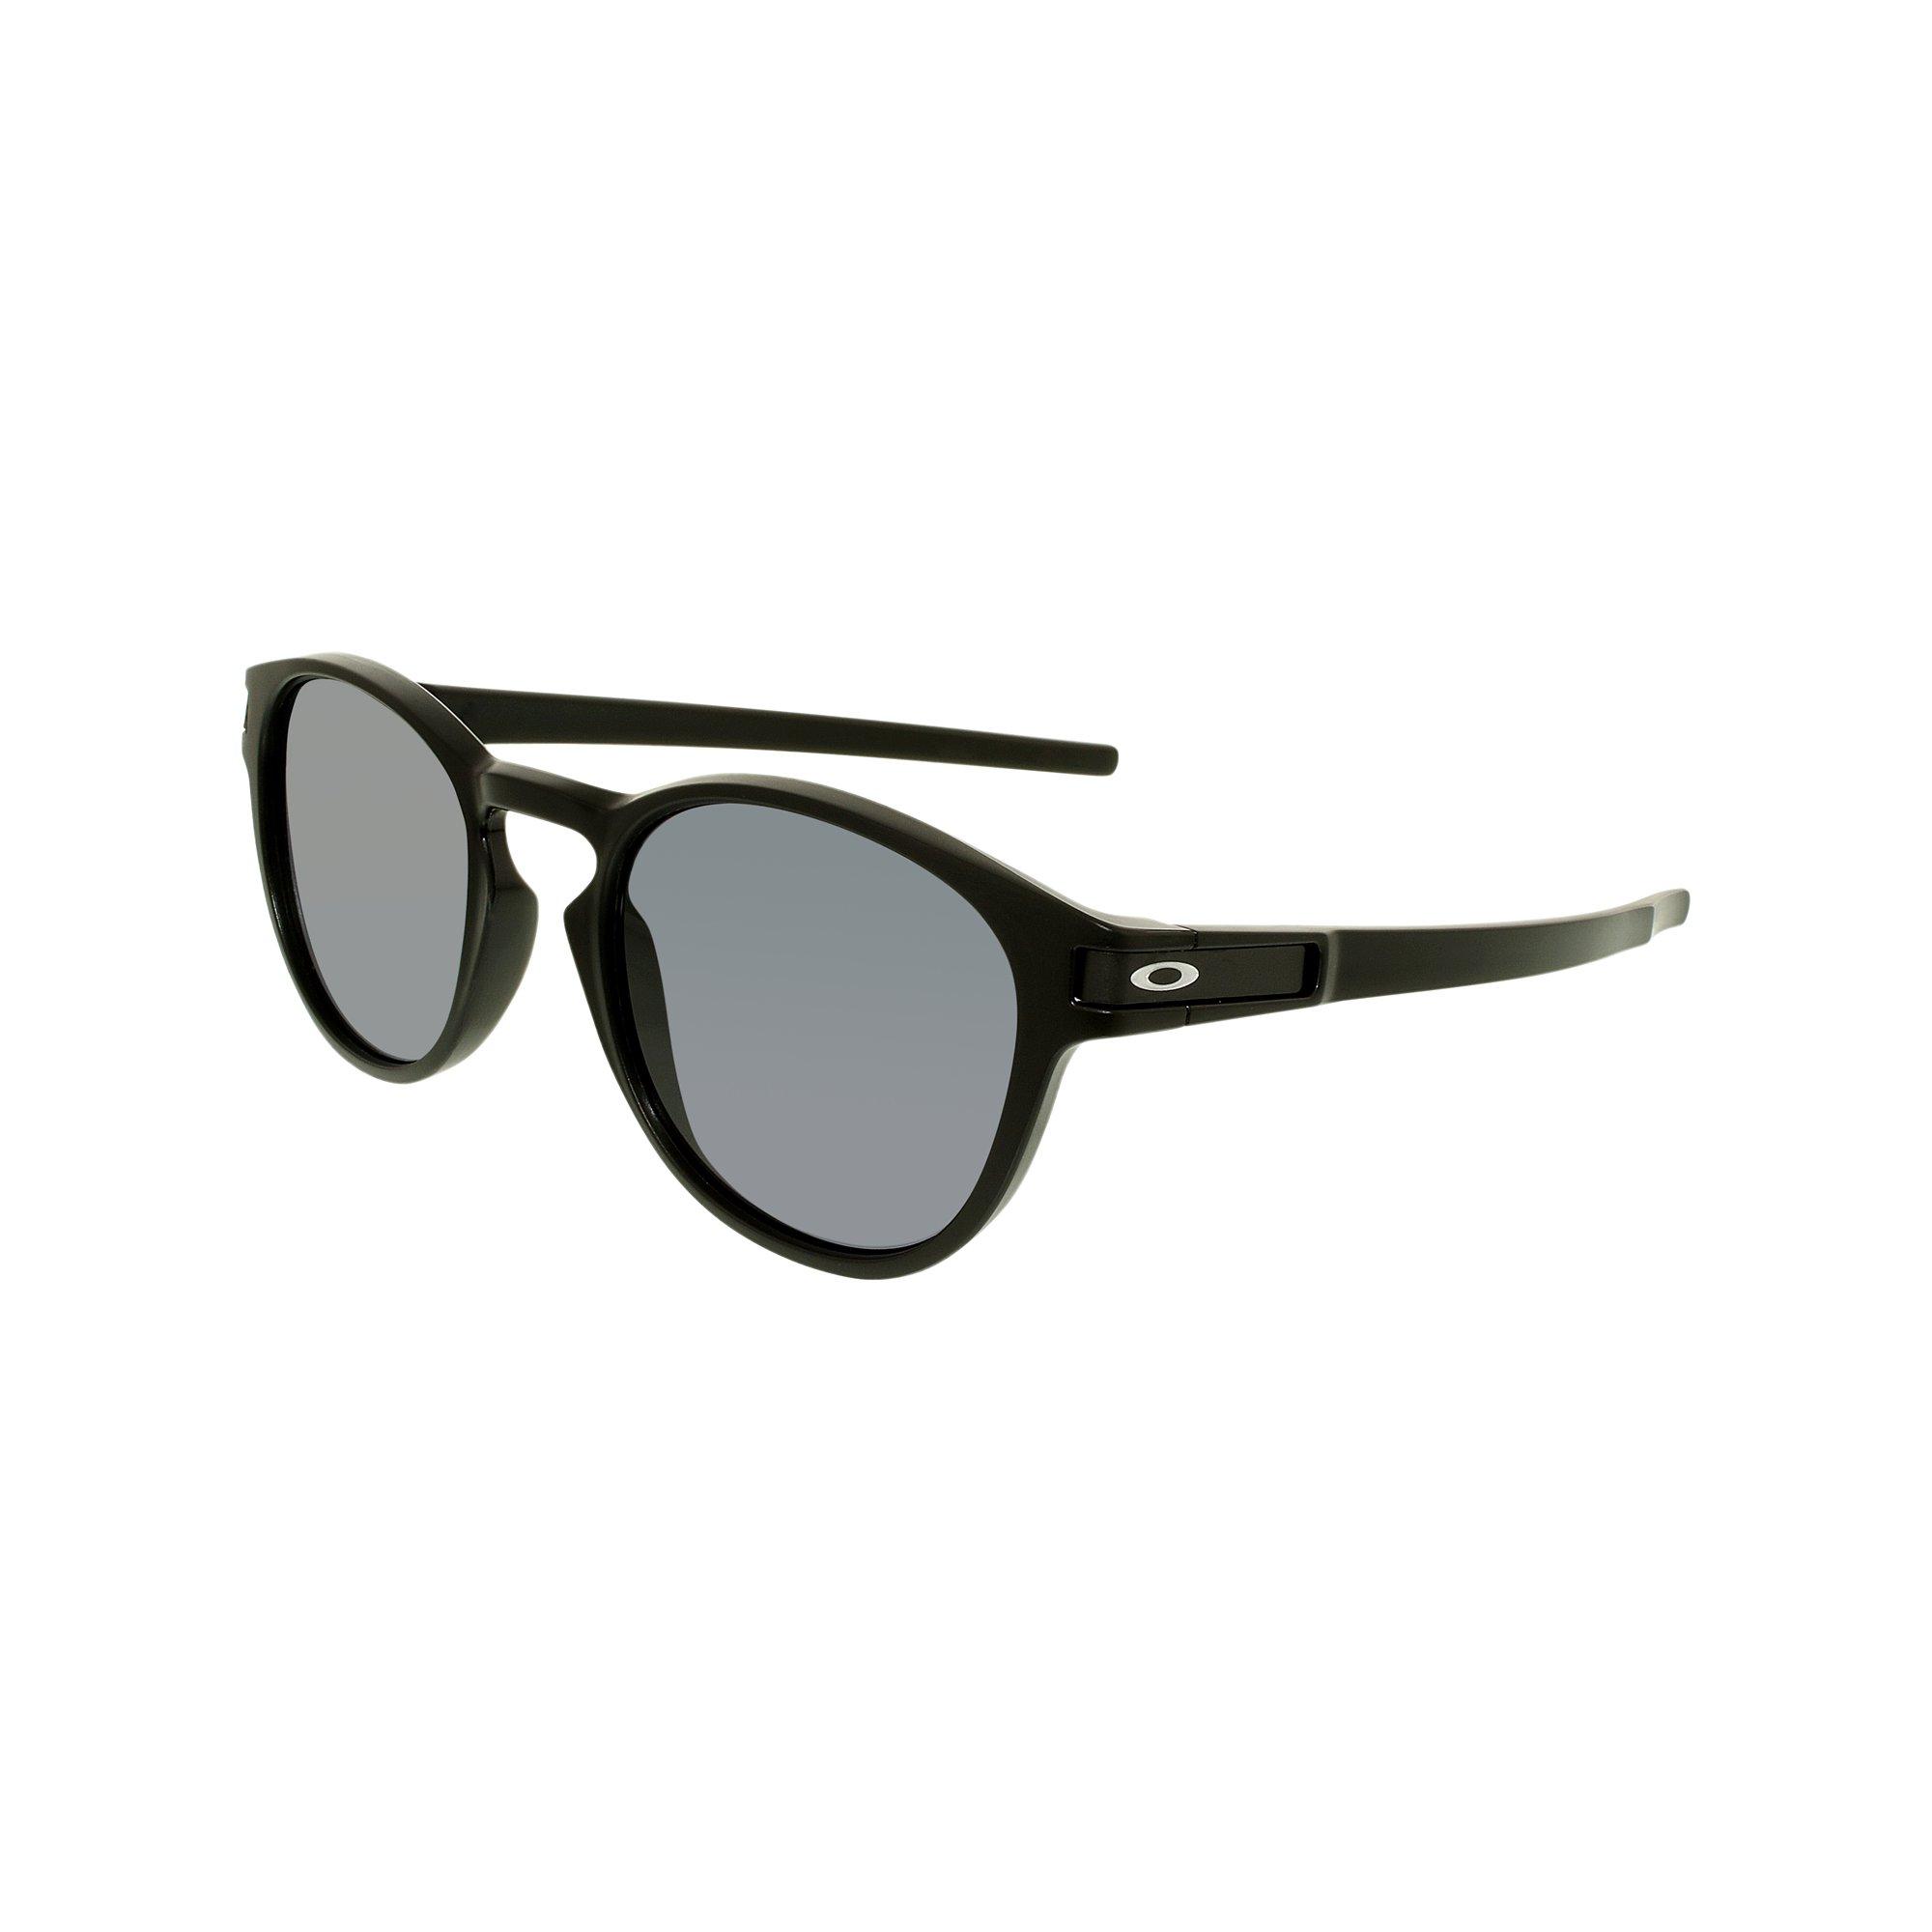 1f8d99bea6 Oakley Men s Latch OO9265-01 Black Round Sunglasses